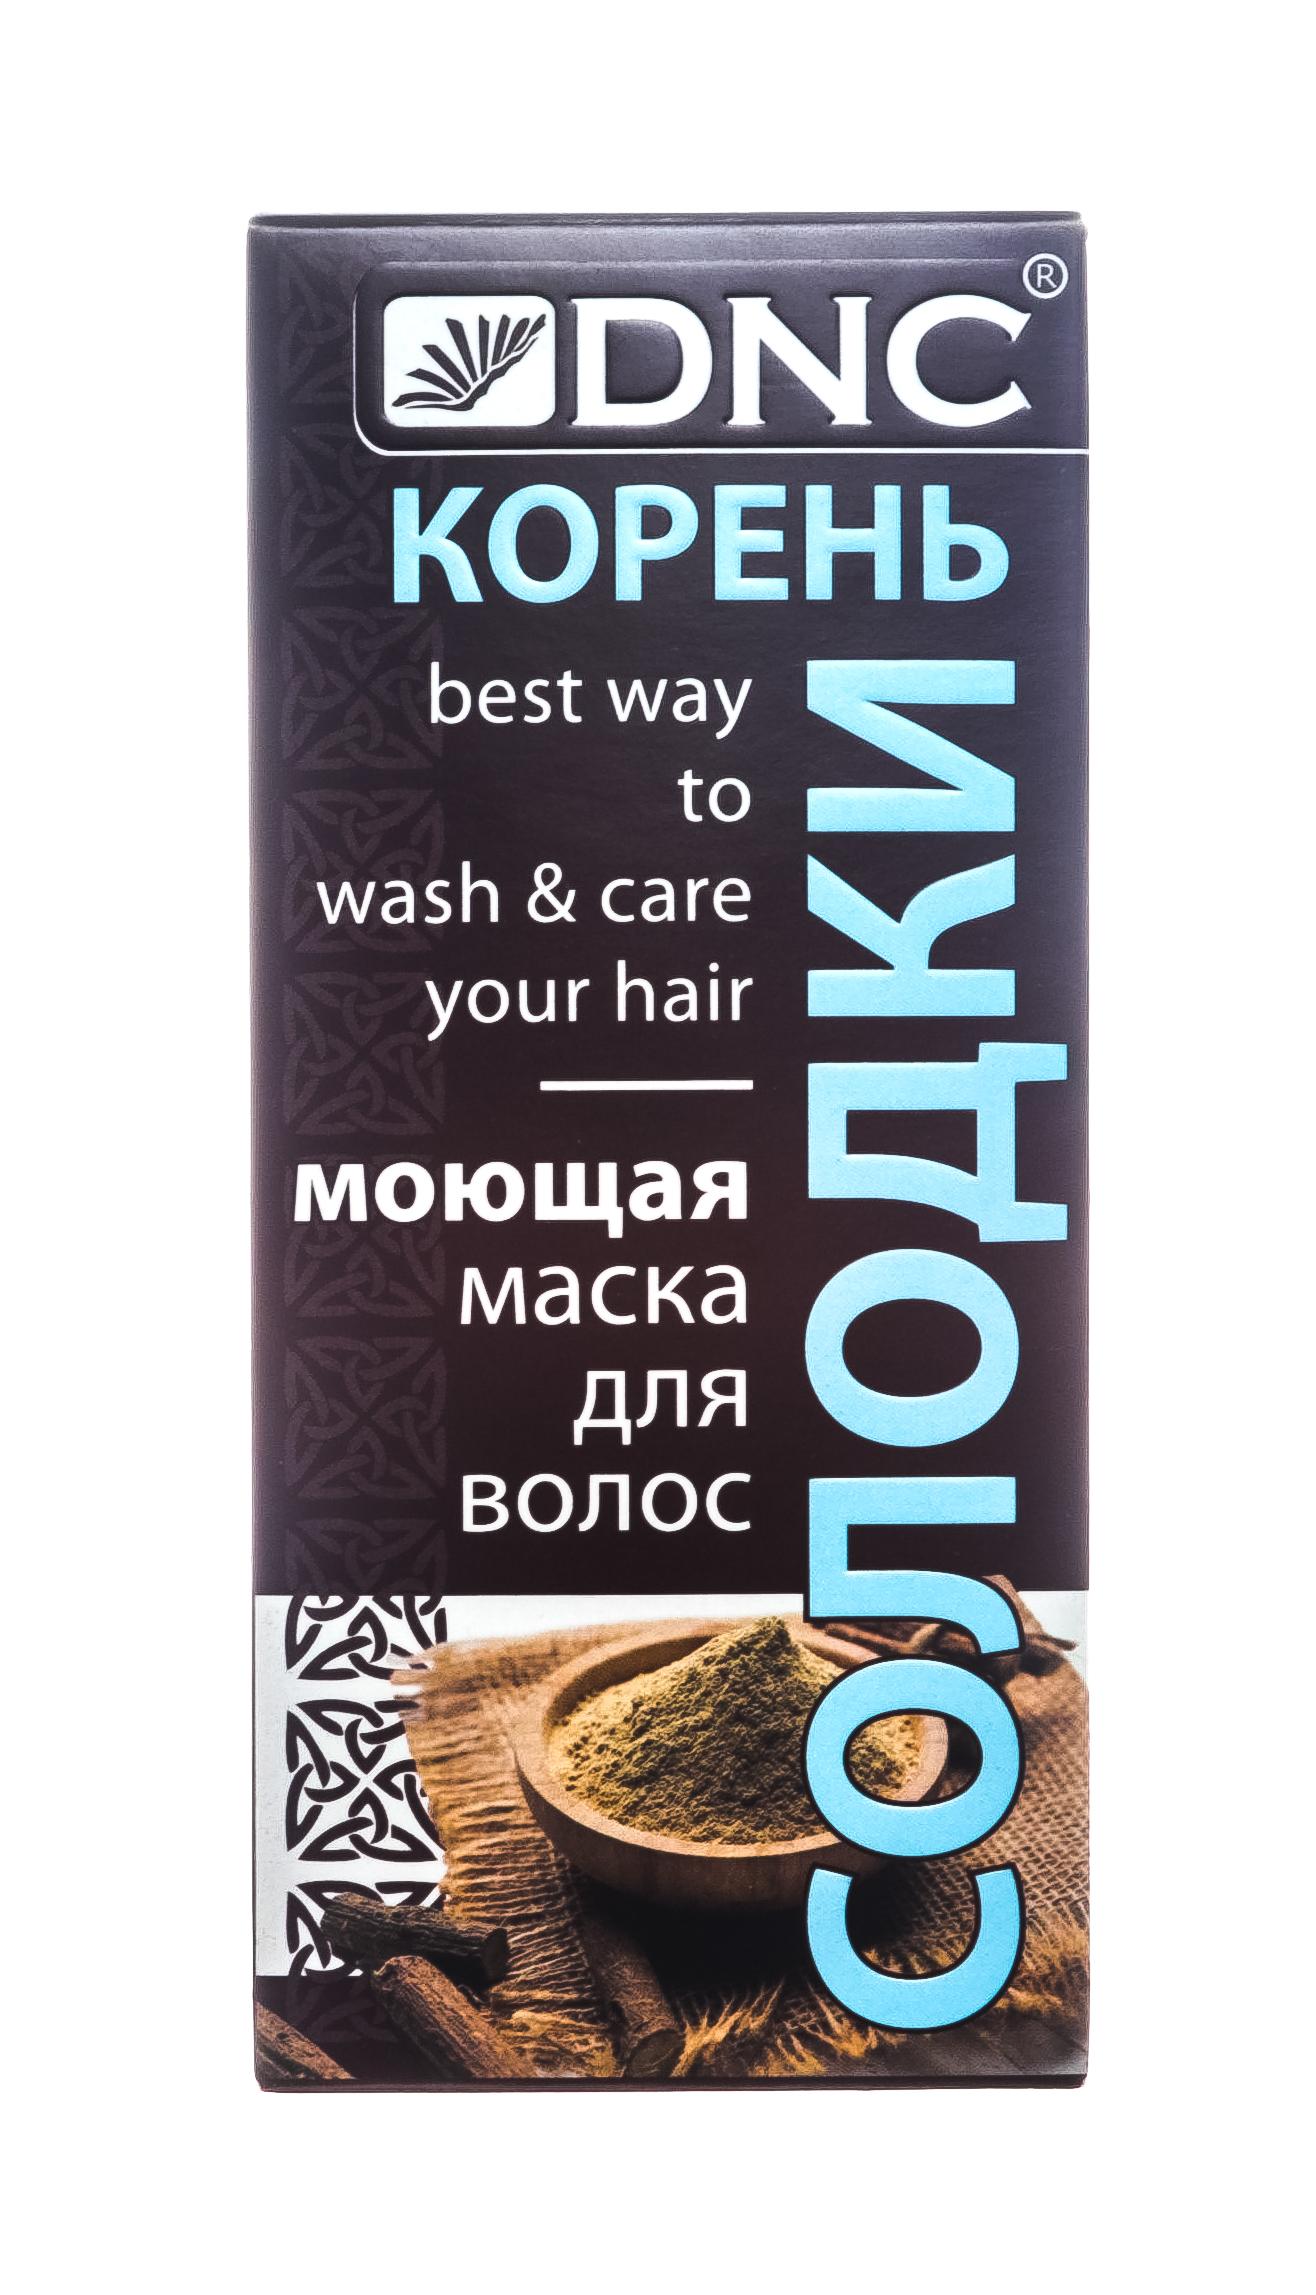 DNC Kosmetika Моющая маска Корень солодки для волос, 4 х 25 г (DNC Kosmetika, Уход за волосами) dnc kosmetika твердый воск для волос 15 мл dnc kosmetika уход за волосами